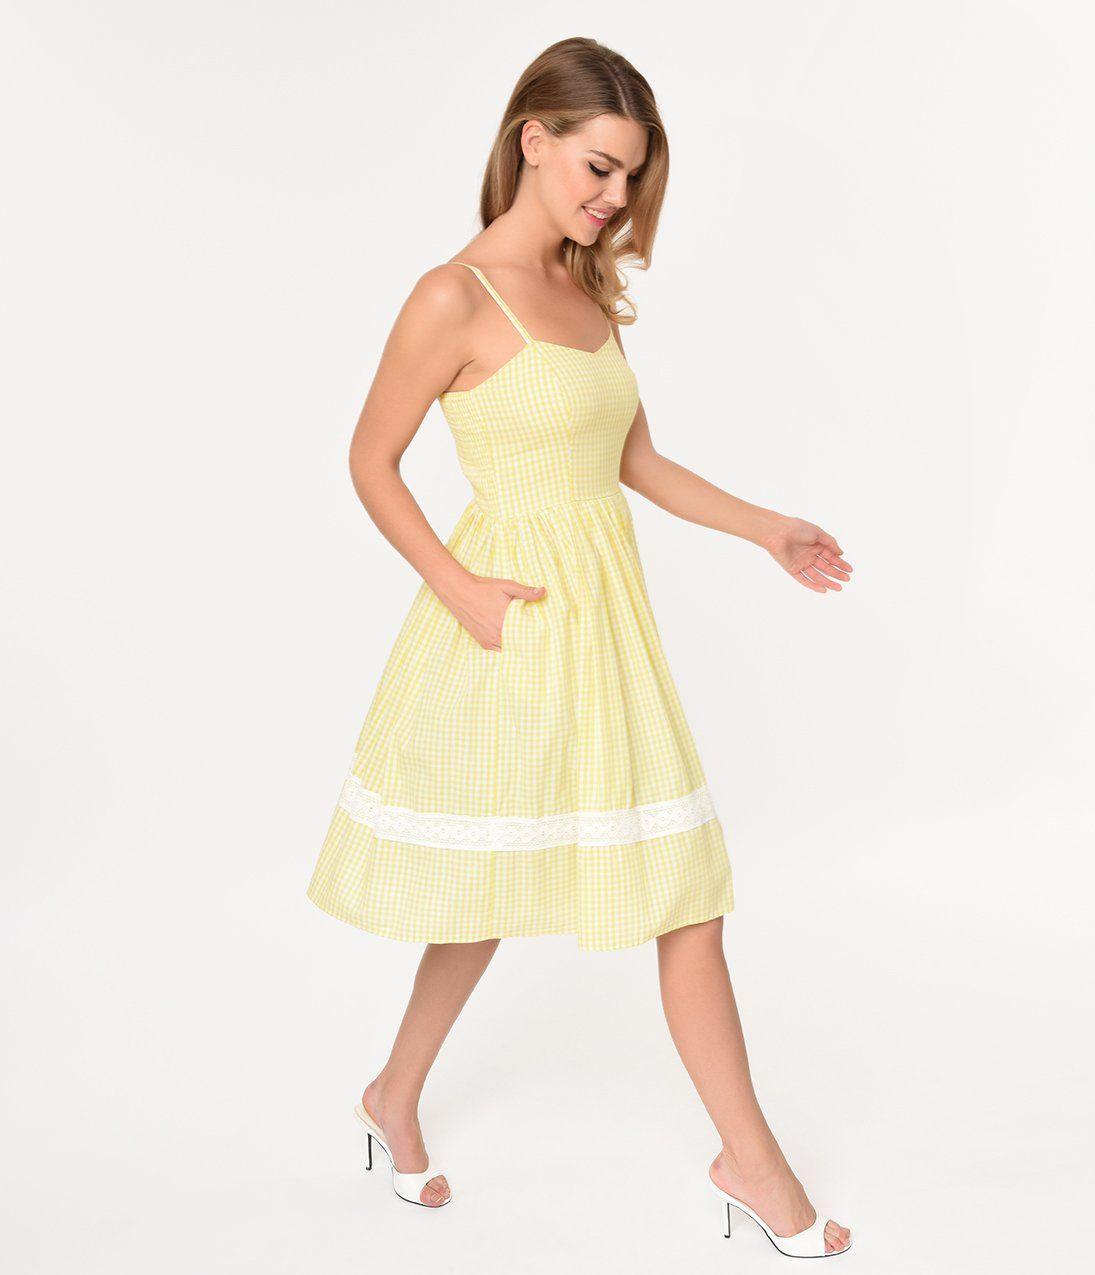 8aa14c363a8d Vintage Style Yellow & White Gingham Cotton Gail Swing Dress – Unique  Vintage